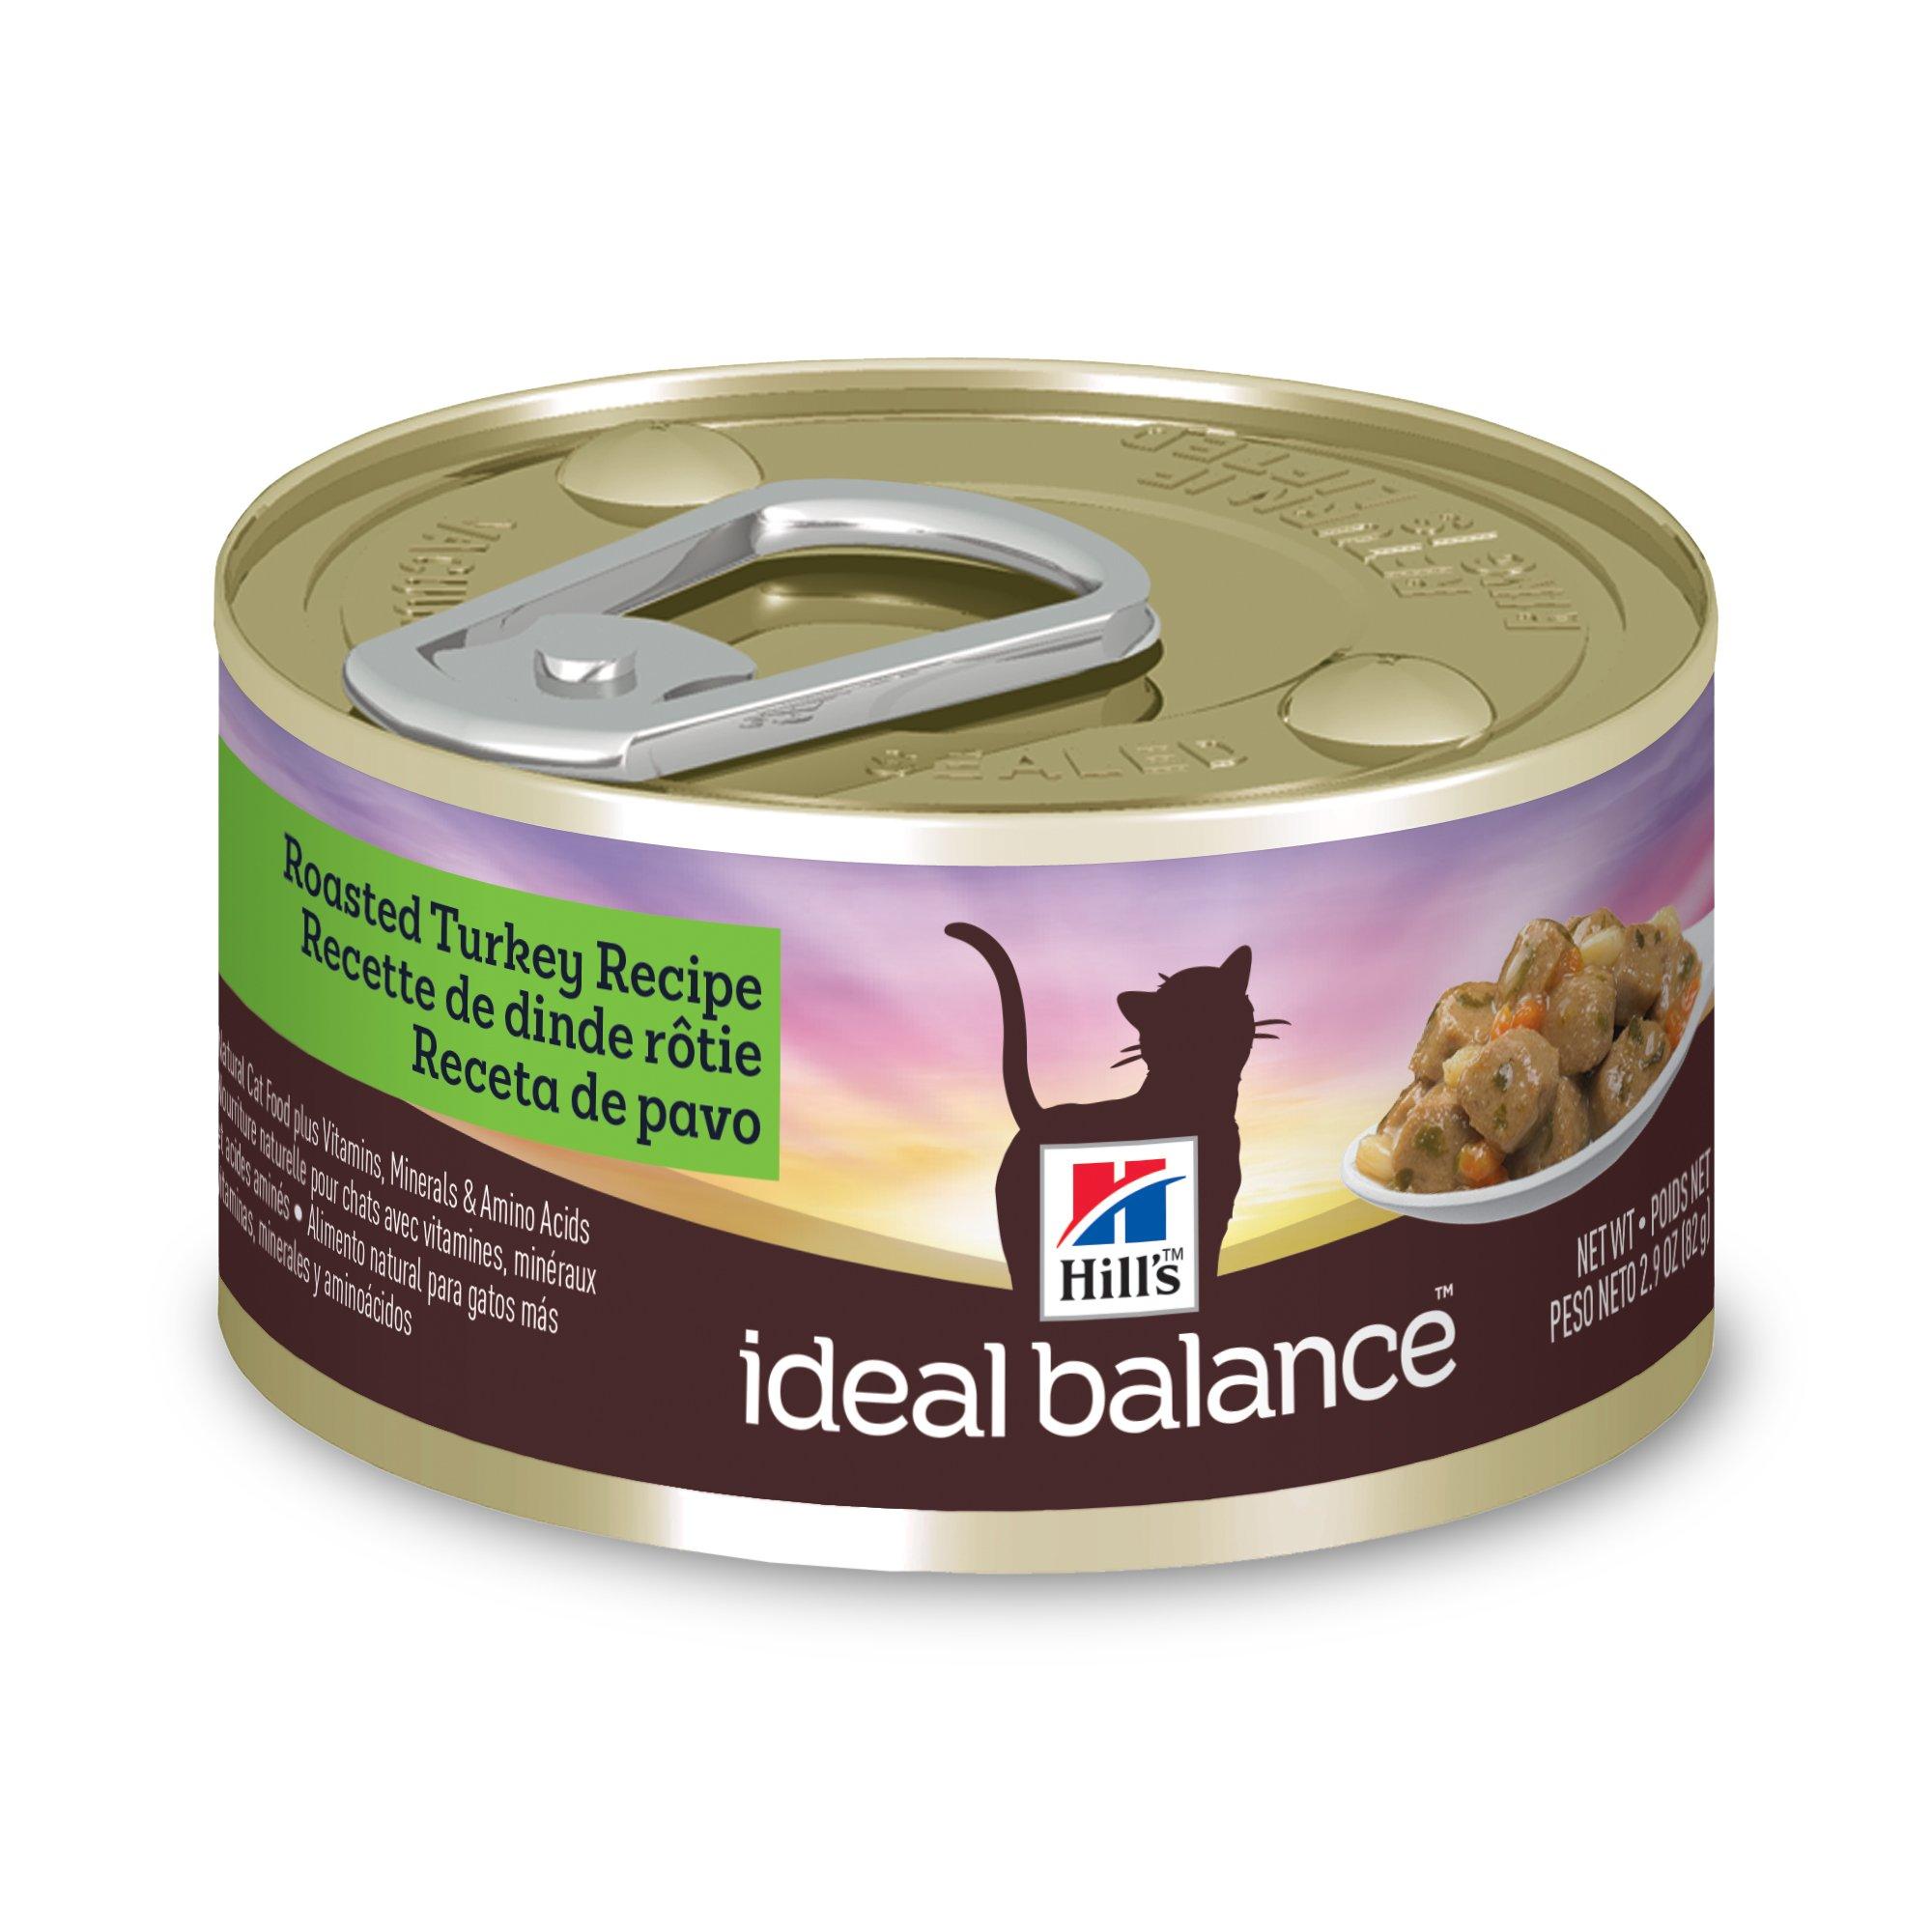 Hills Ideal Balance Natural Cat Food product image